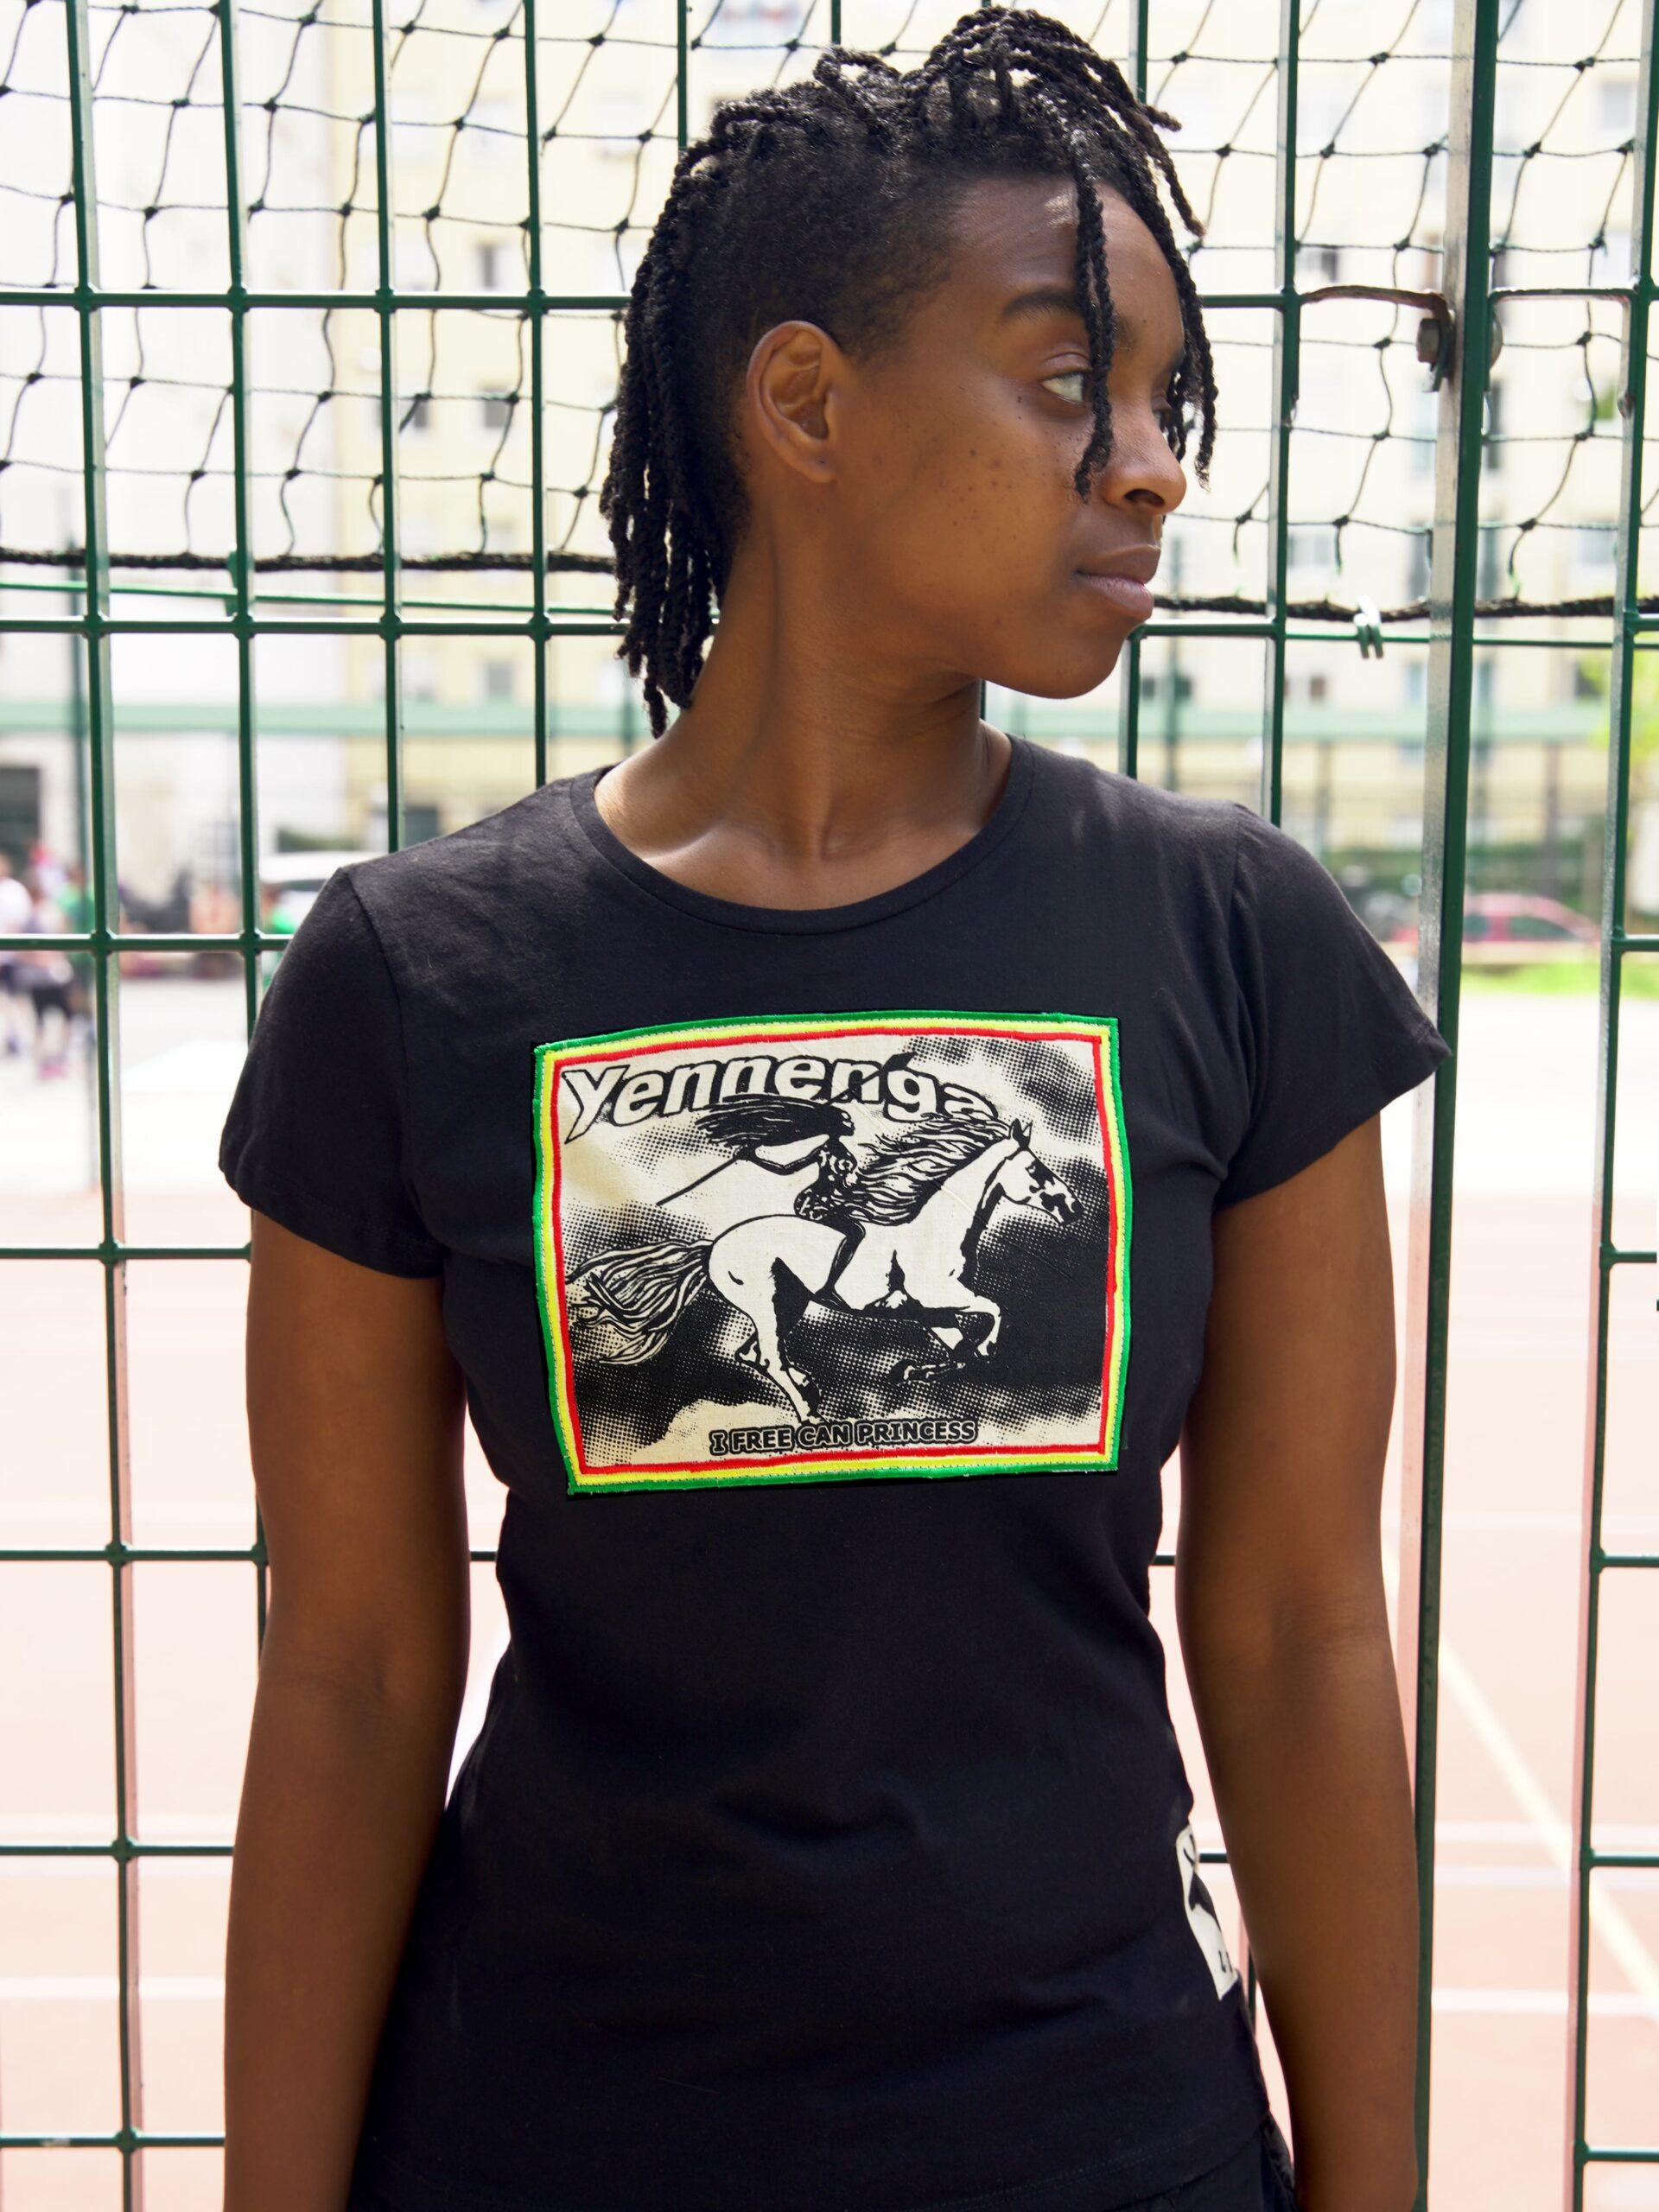 T.Shirt Femme Princesse Yennenga -noir